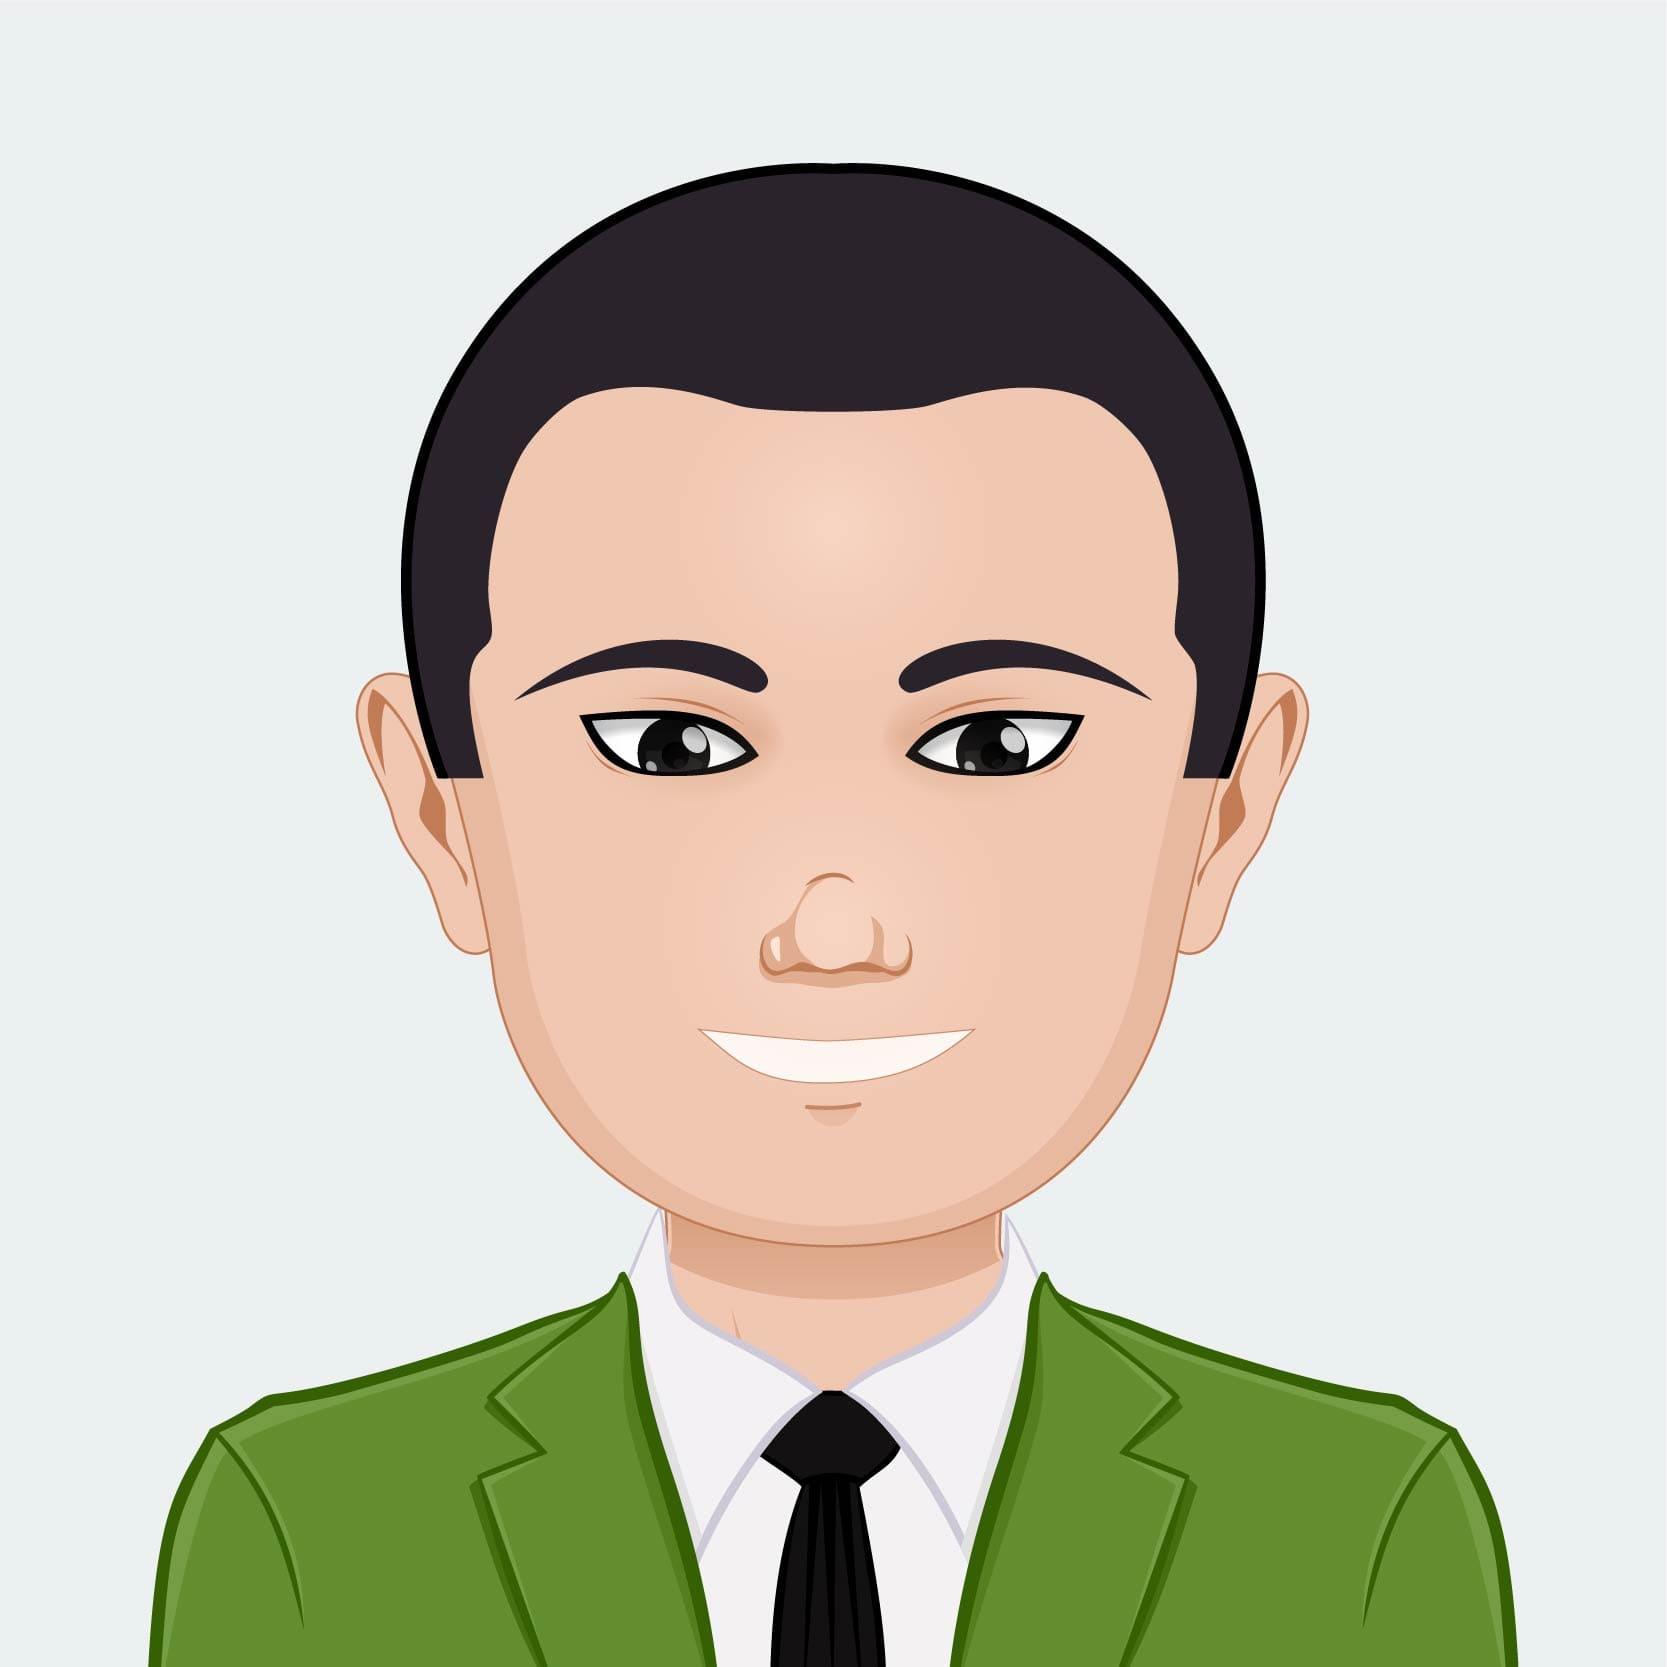 echo $mentor_image['alt'];